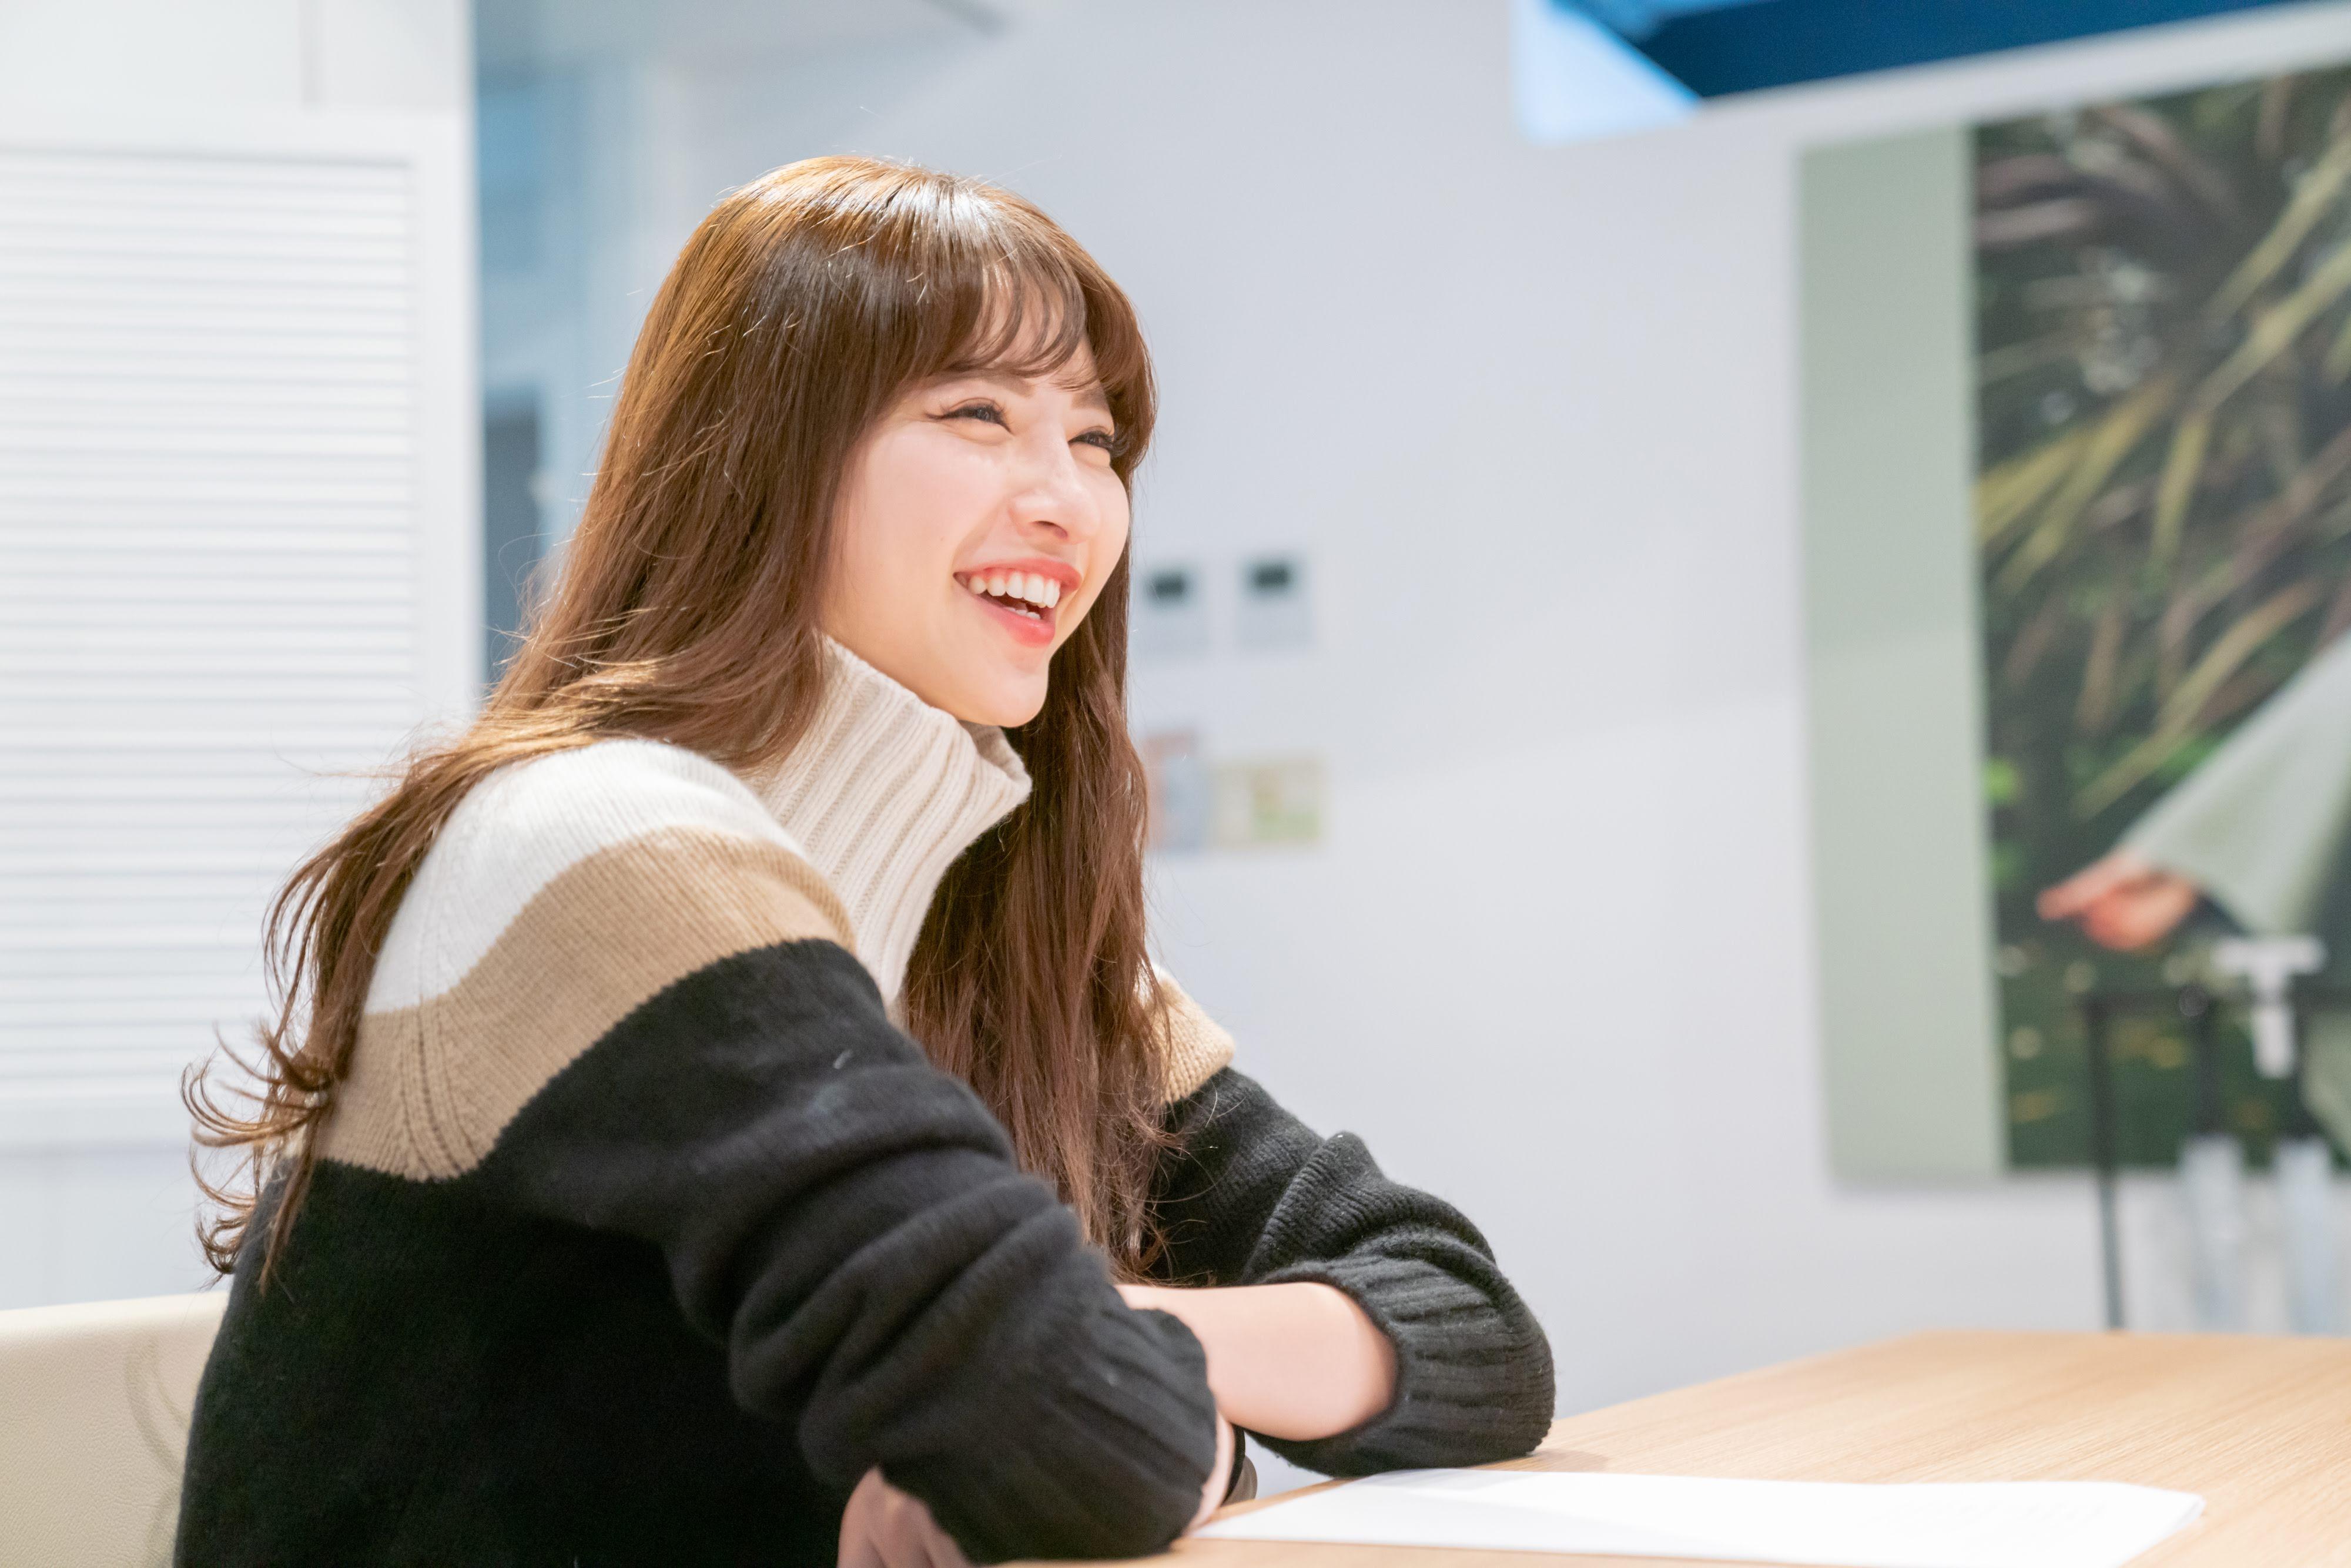 DINETTE株式会社 代表取締役 CEO 尾崎 美紀氏